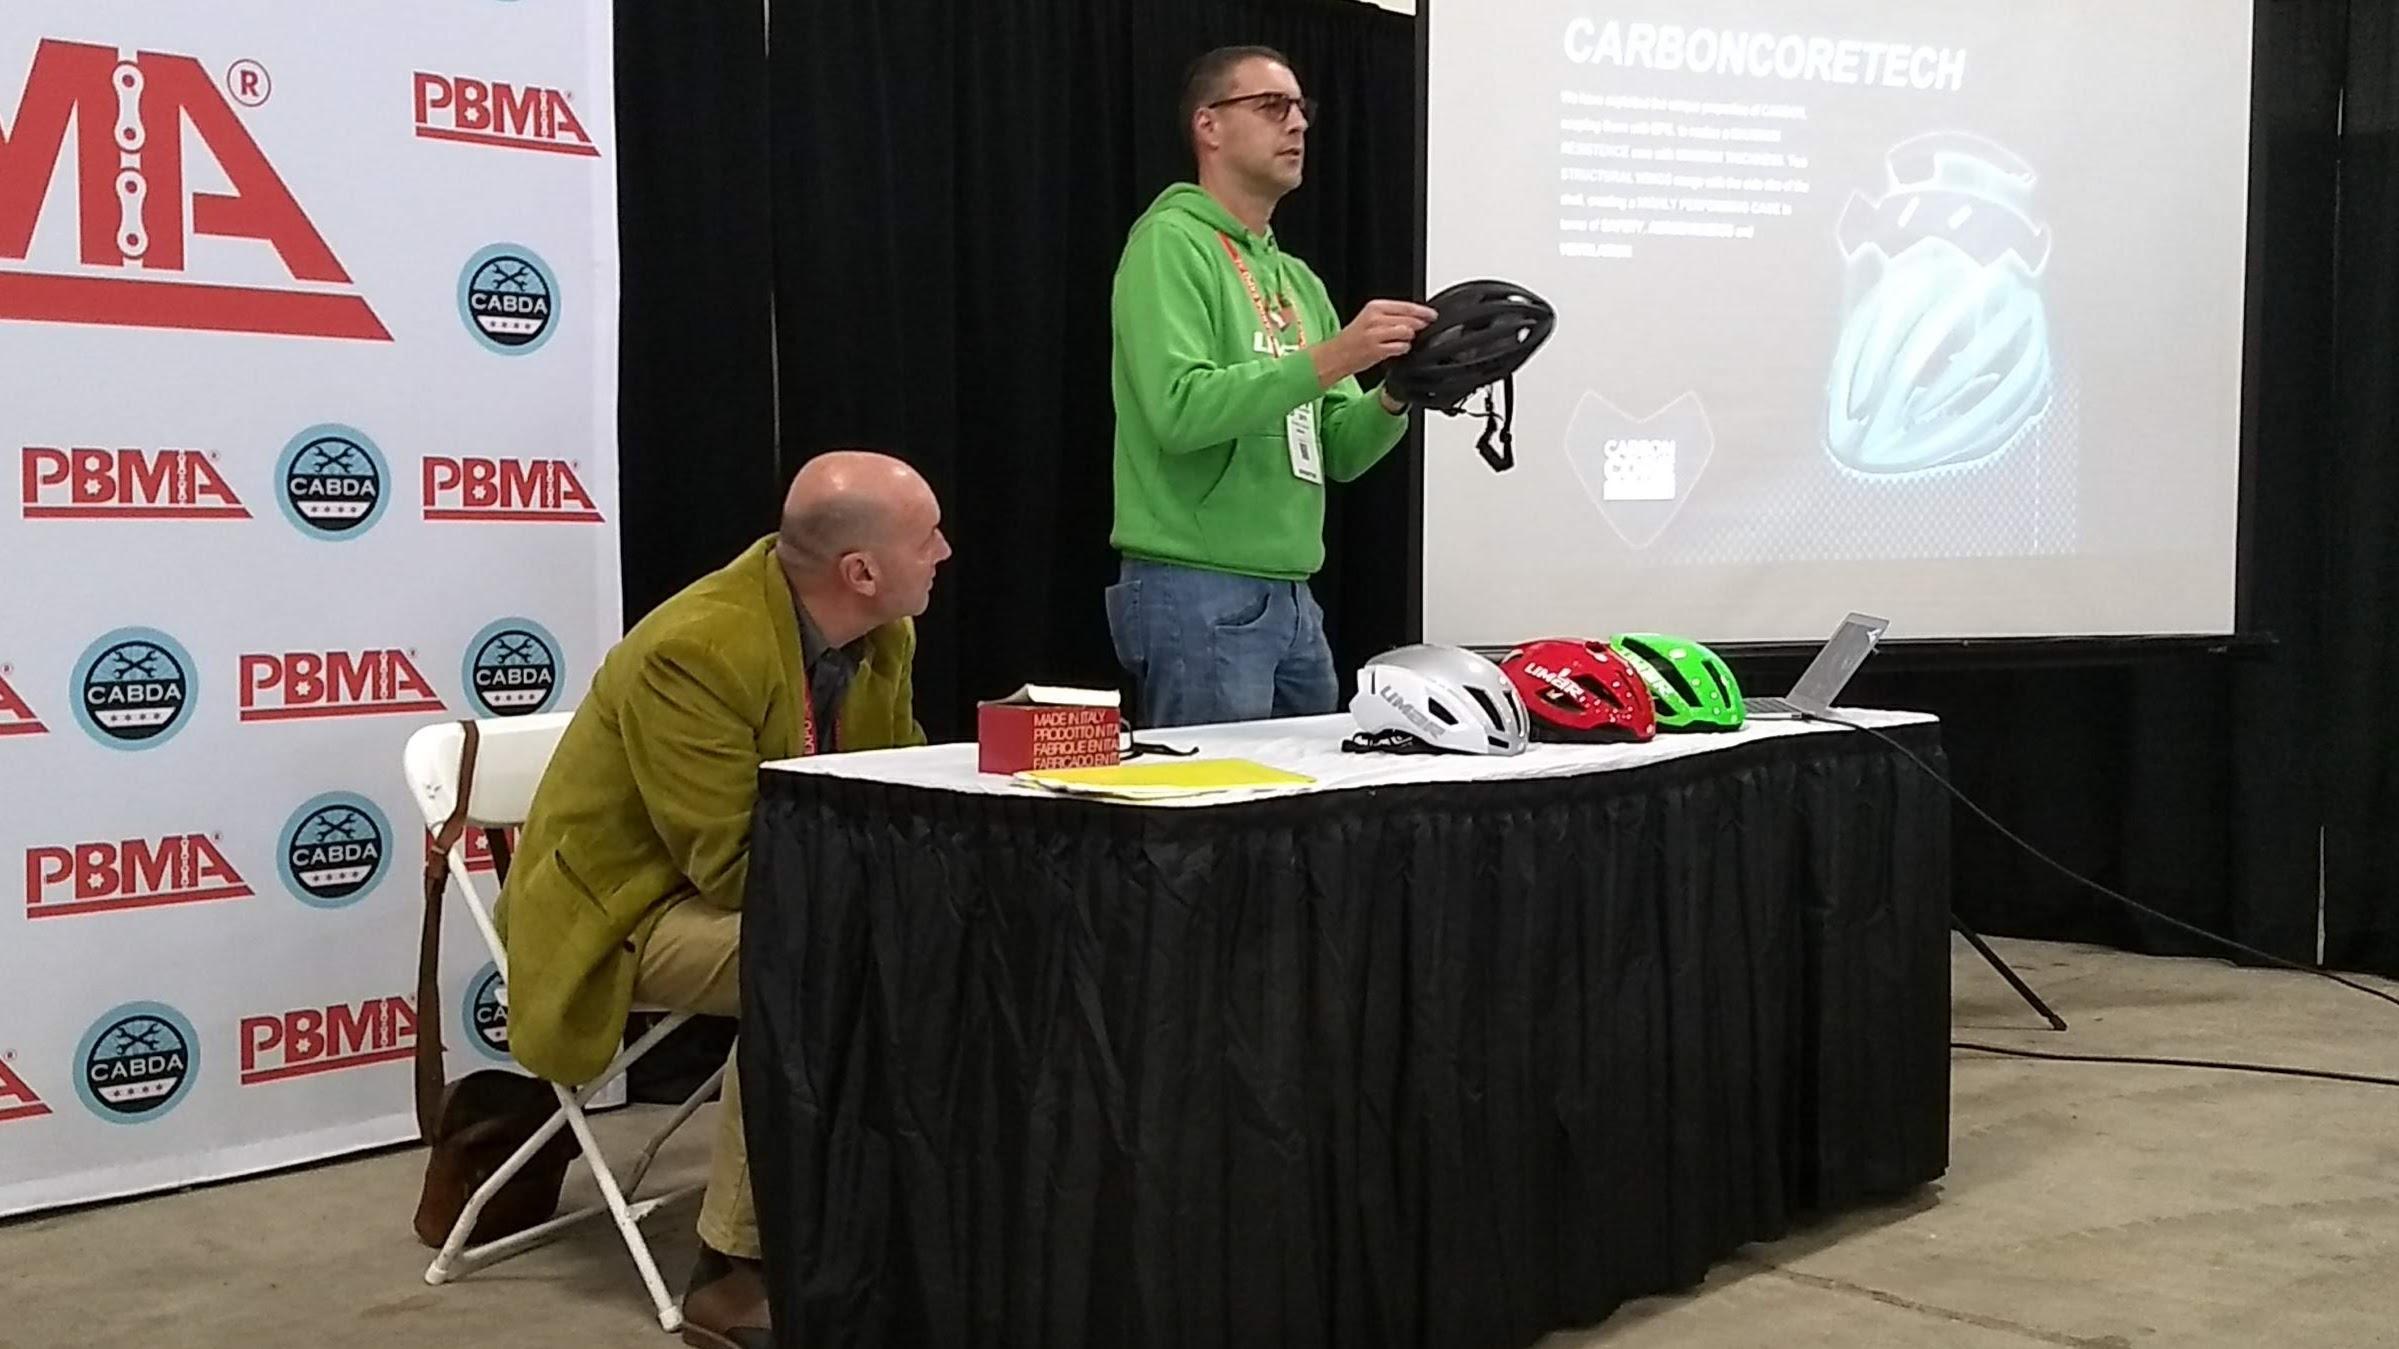 Limar helmets seminar by Giovanni Caporali